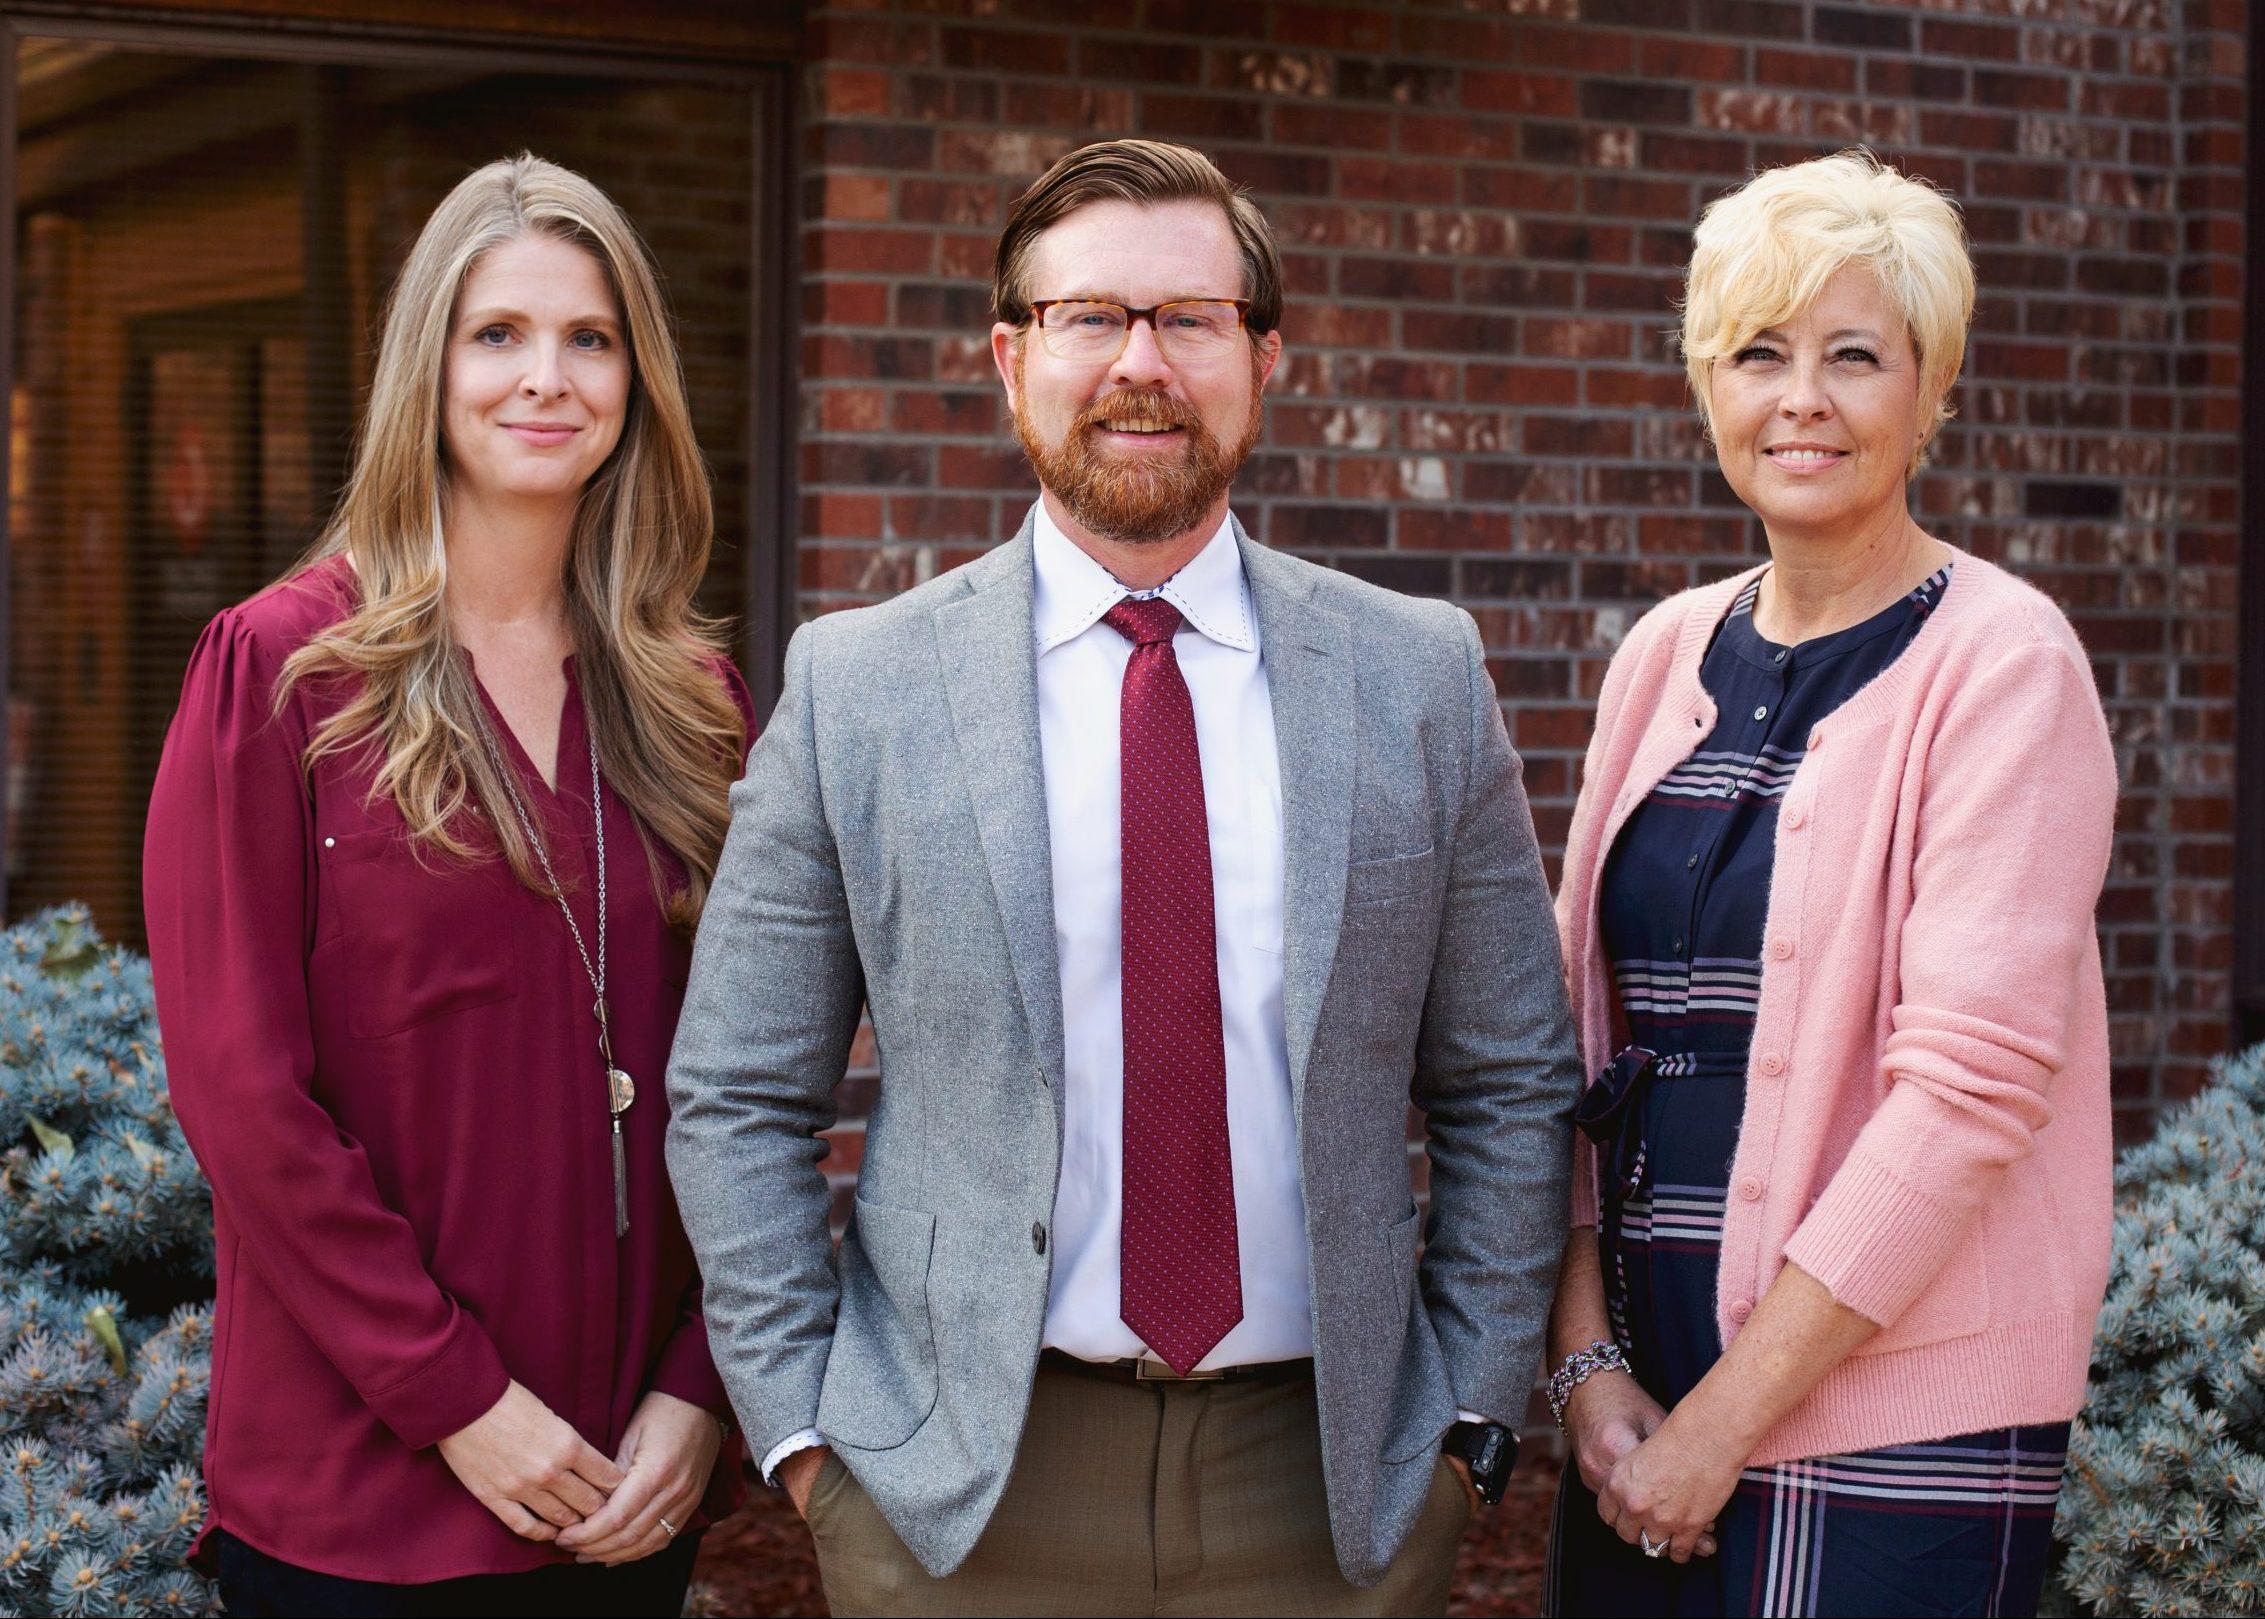 Denver's Premier Personal Injury Firm